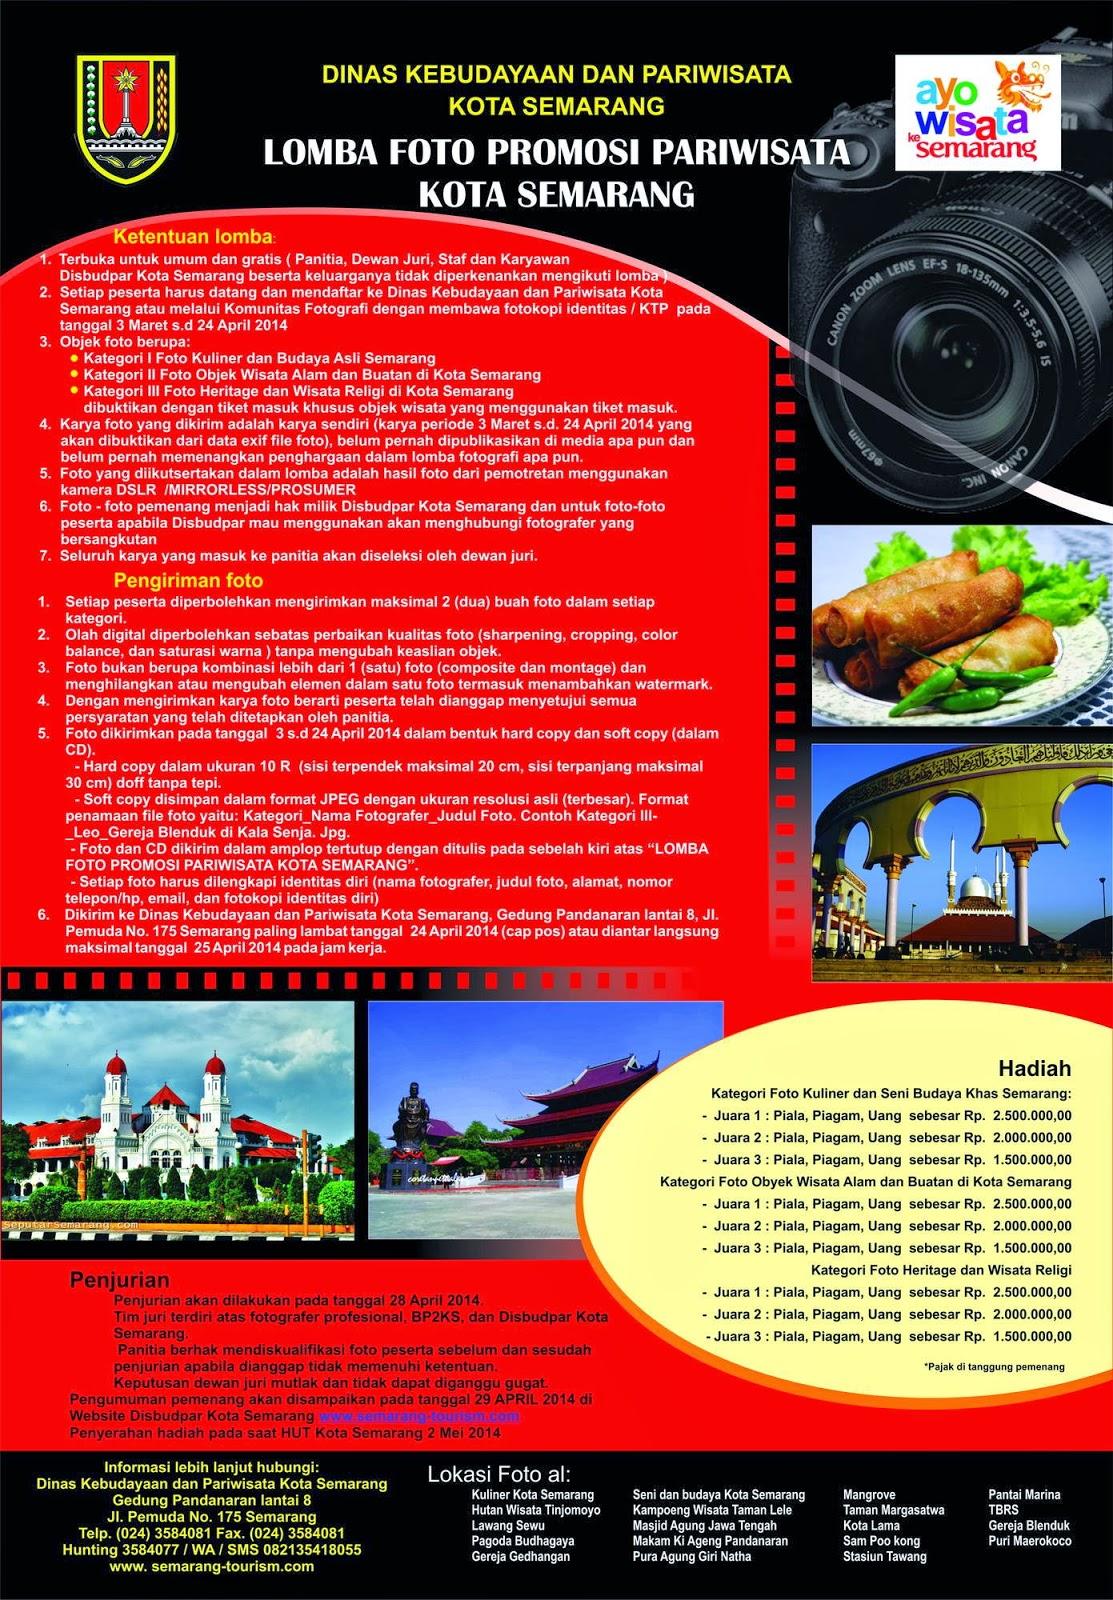 Lomba Fotografi Pariwisata Kota Semarang Deadline 24 April 2014